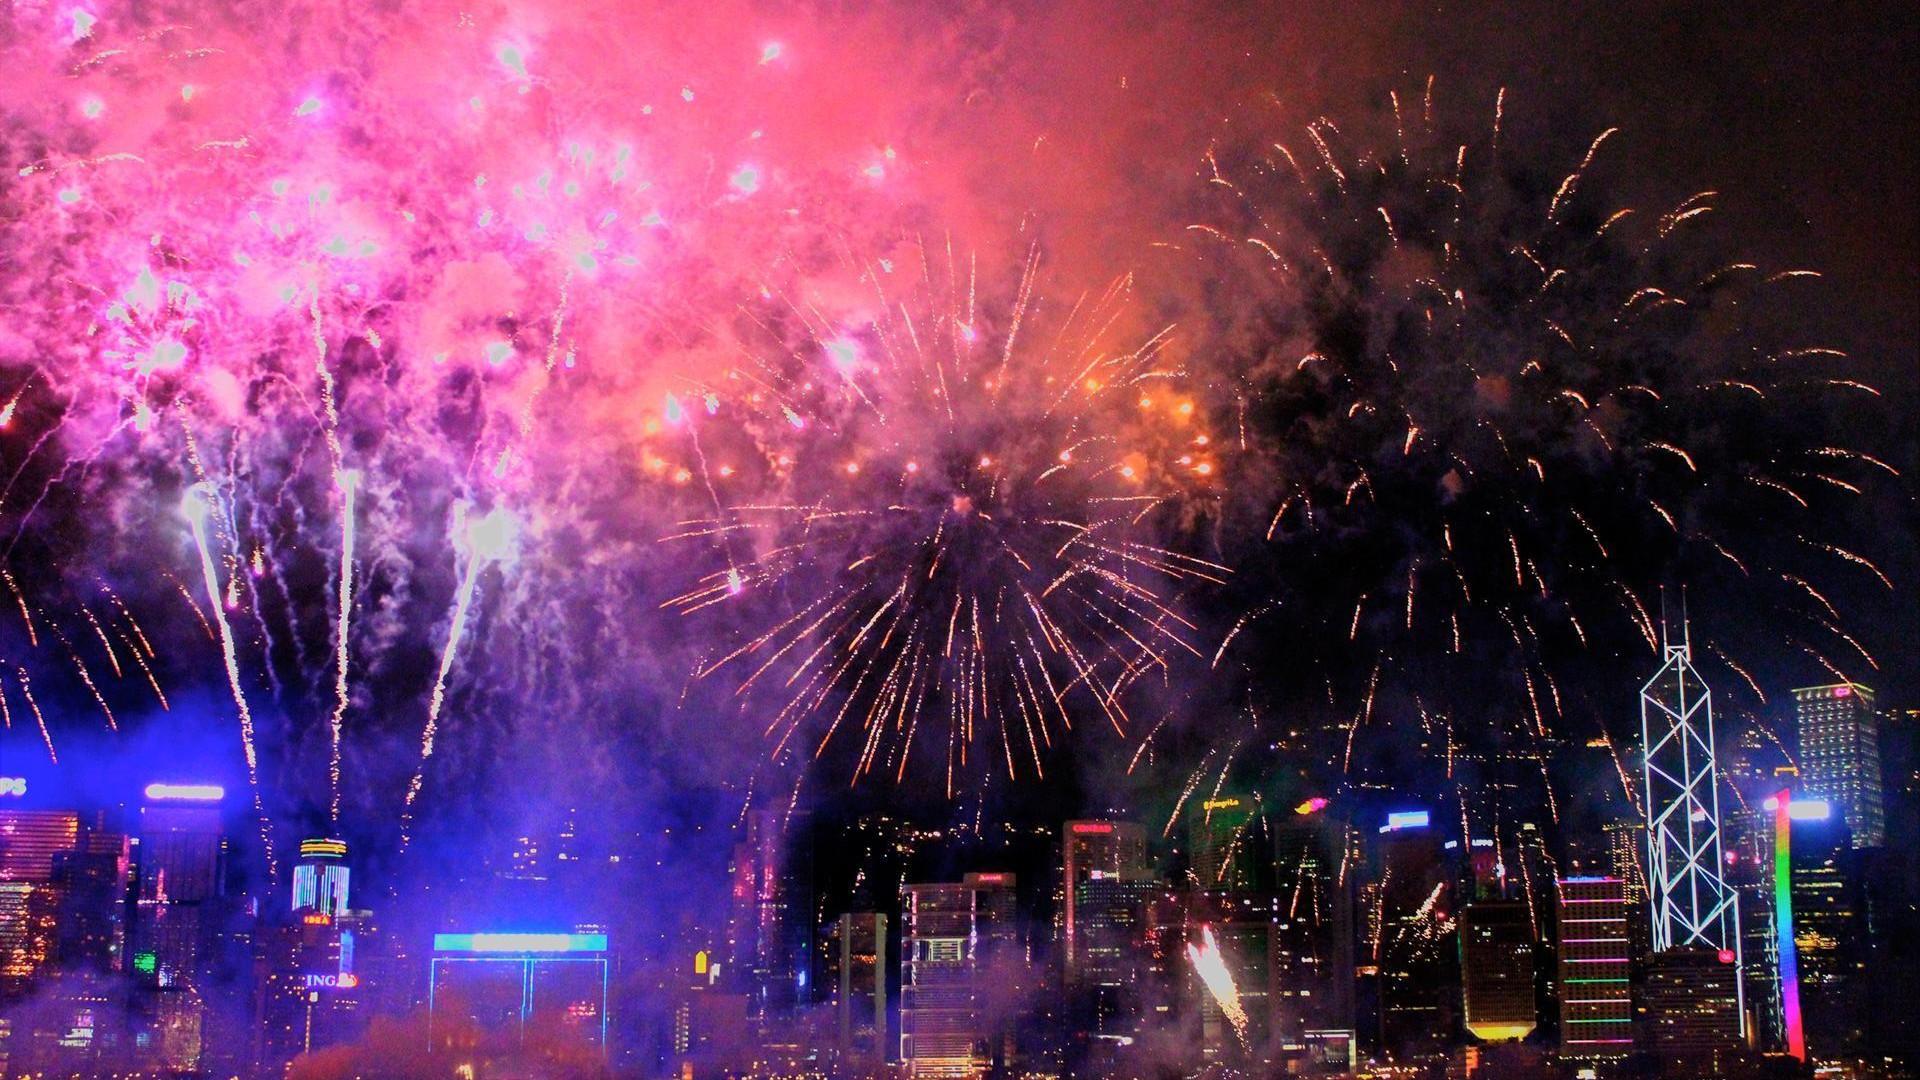 city firework display hd wallpaper